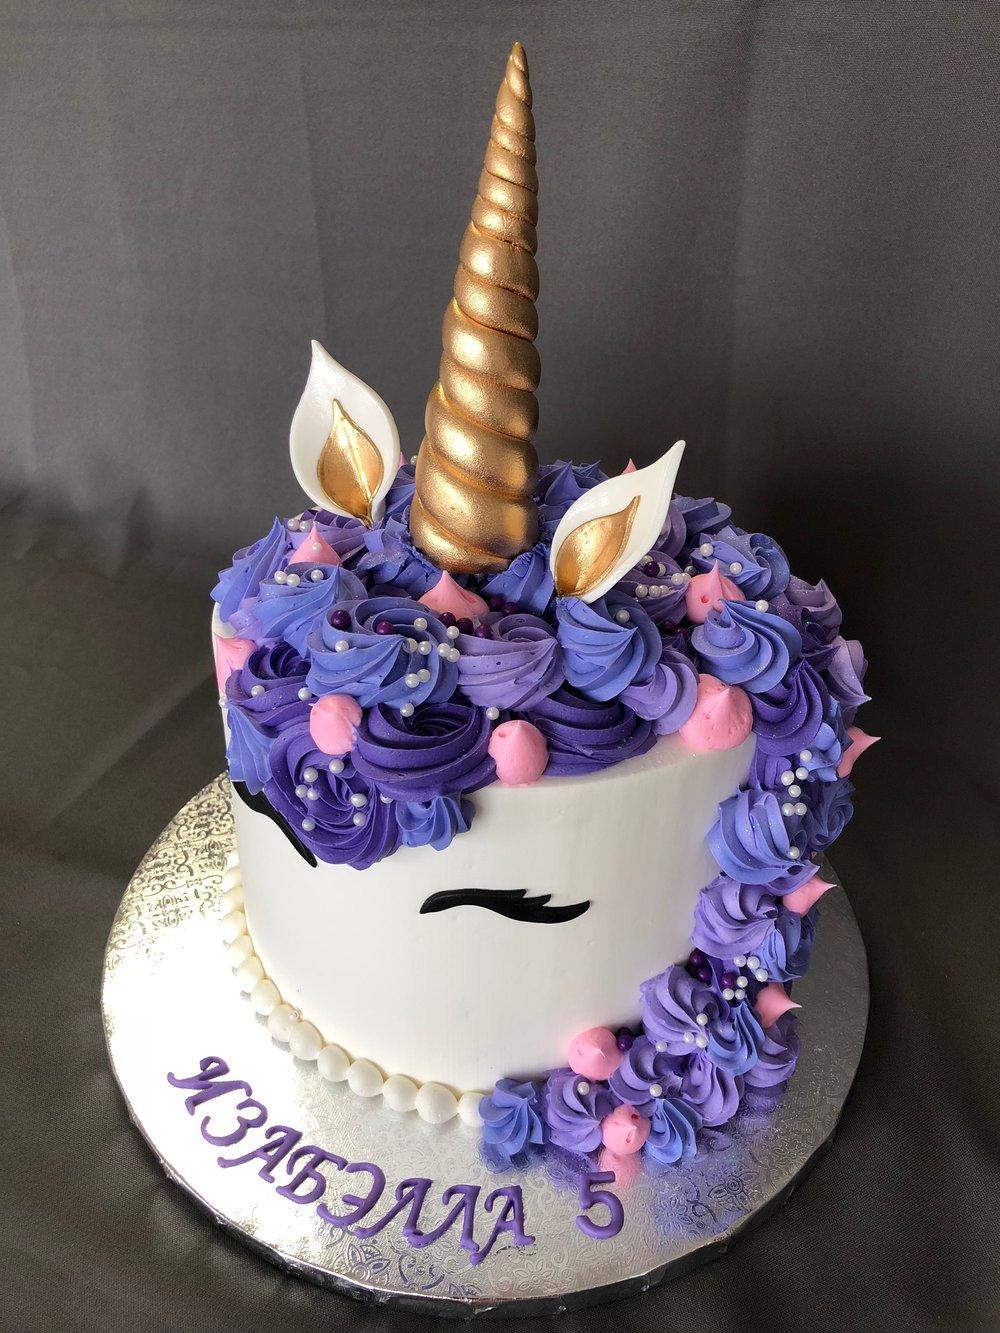 Best Unicorn Birthday Cake NJ